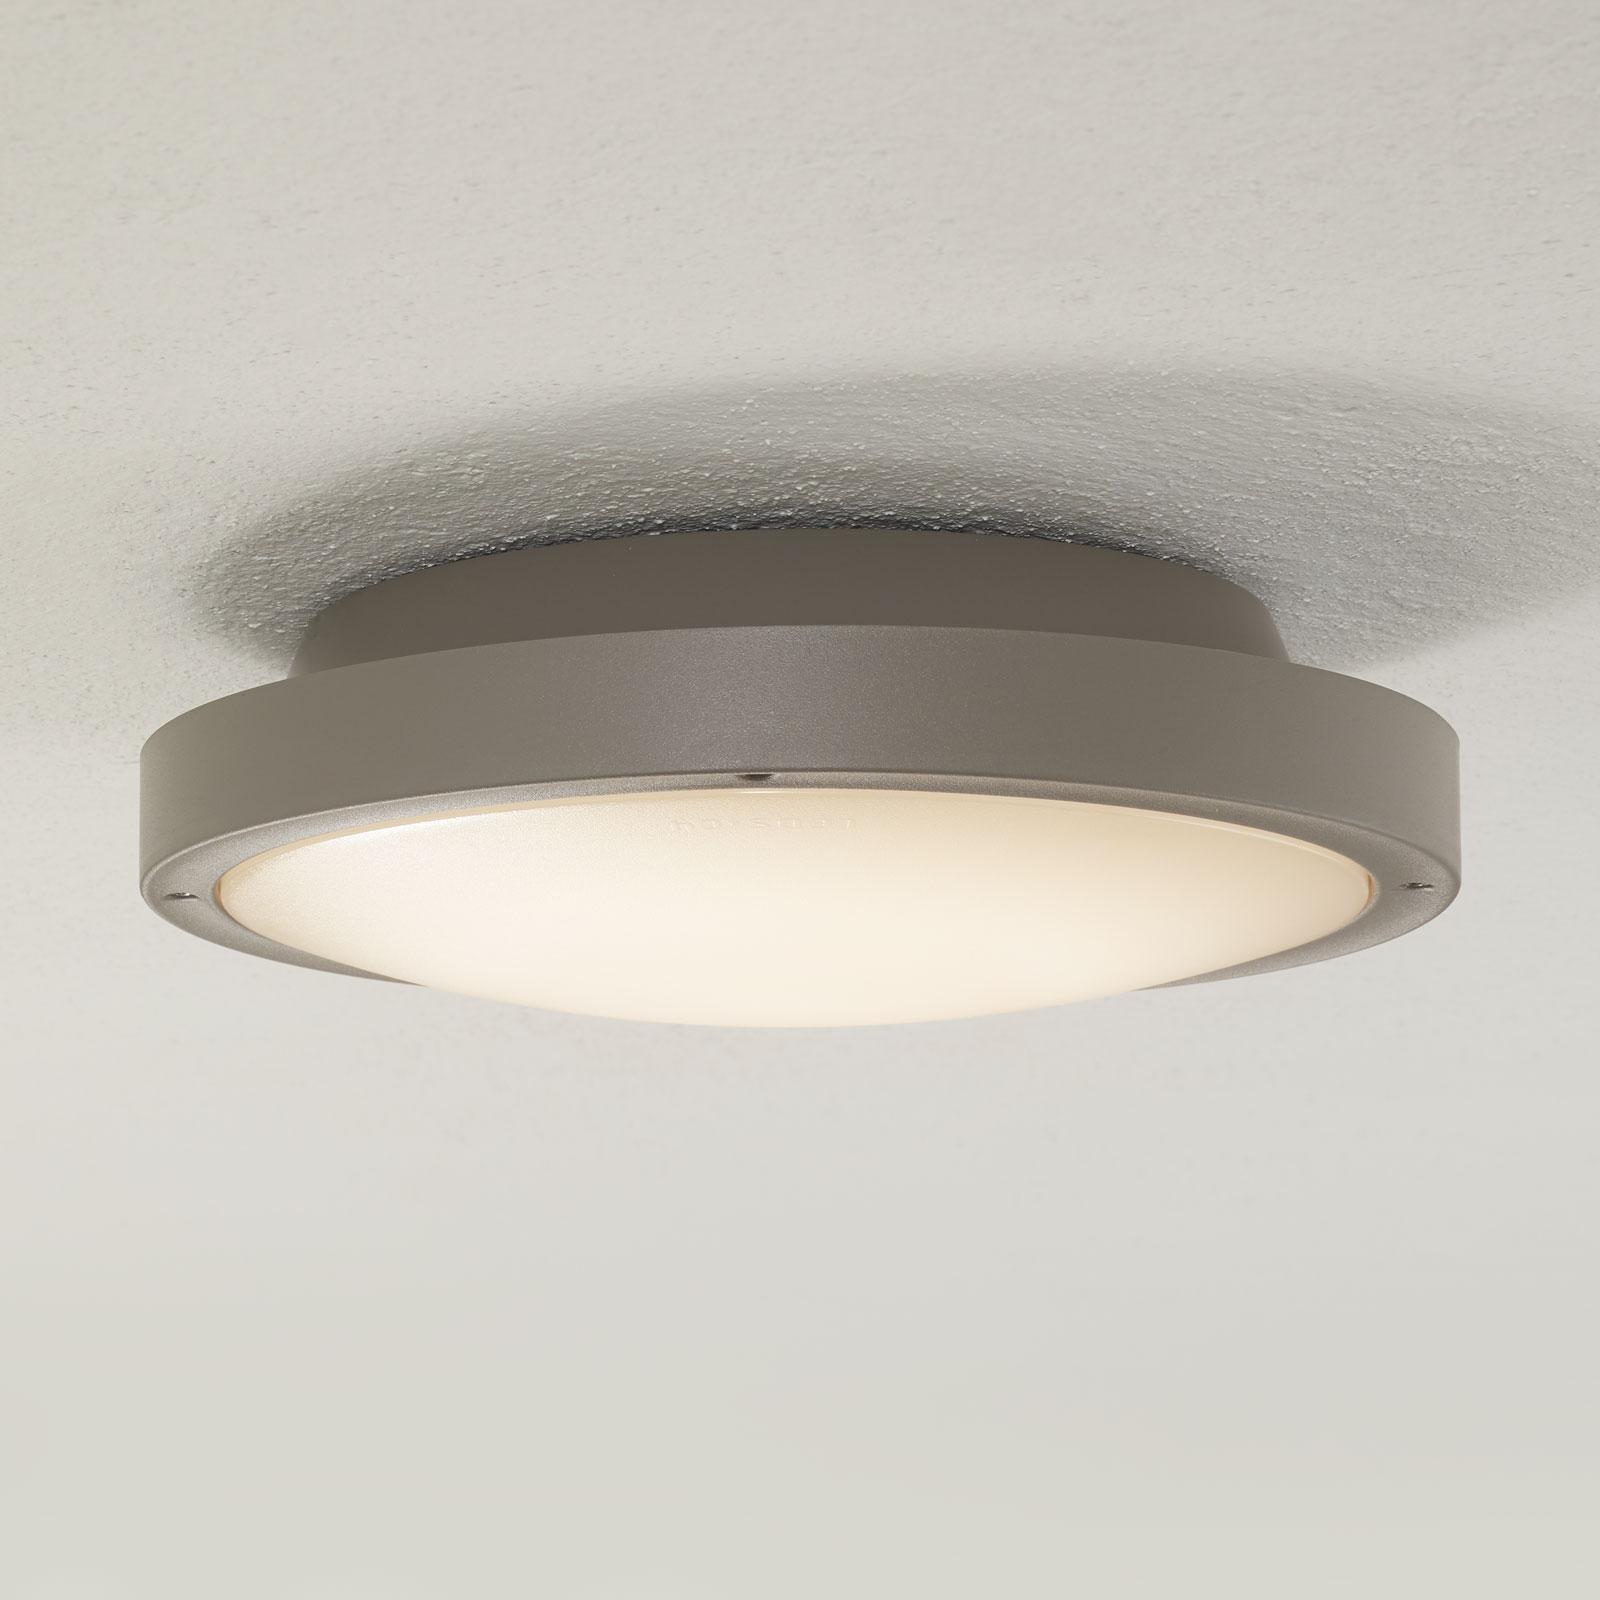 Arcchio Benian lampa sufitowa LED 3000K